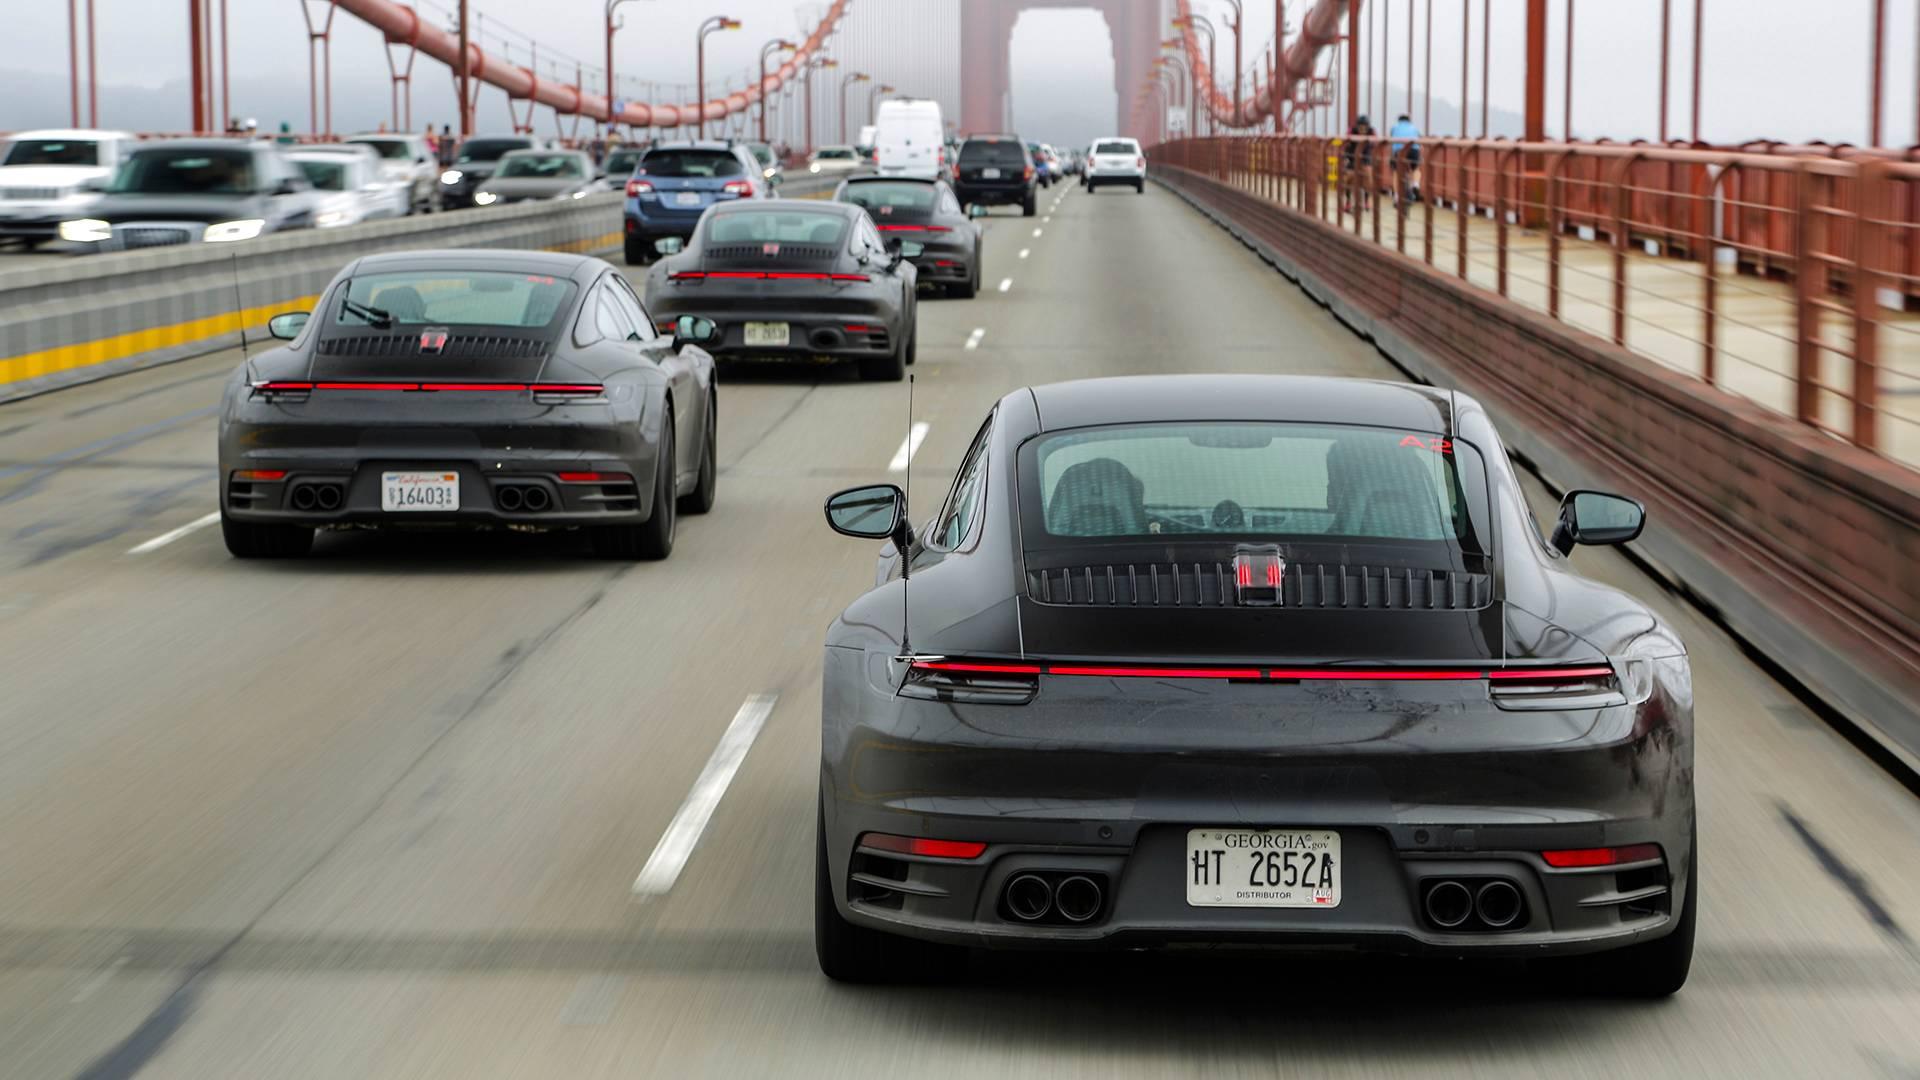 2020-porsche-911-carrera-s-prototyp6